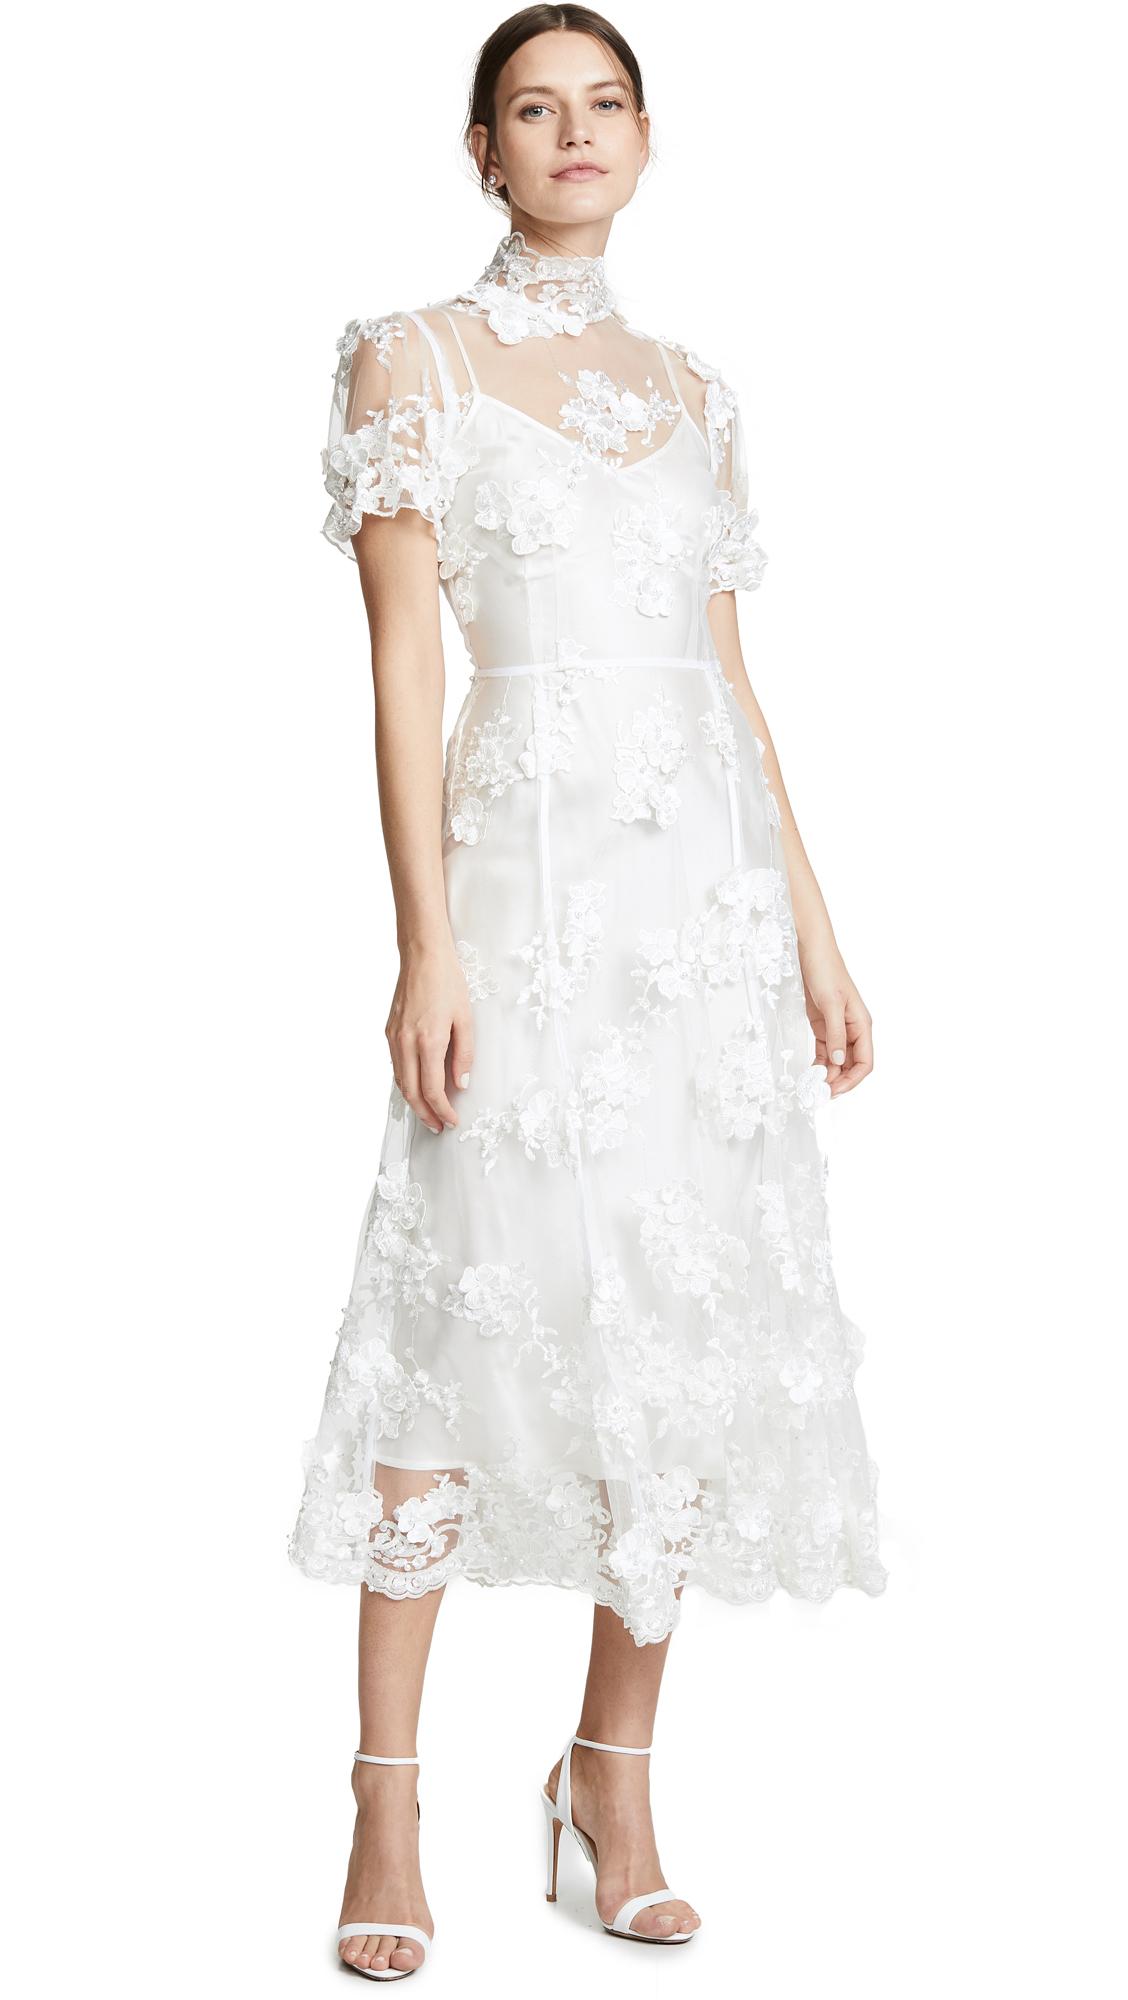 macgraw Porcelain Dress - Ivory